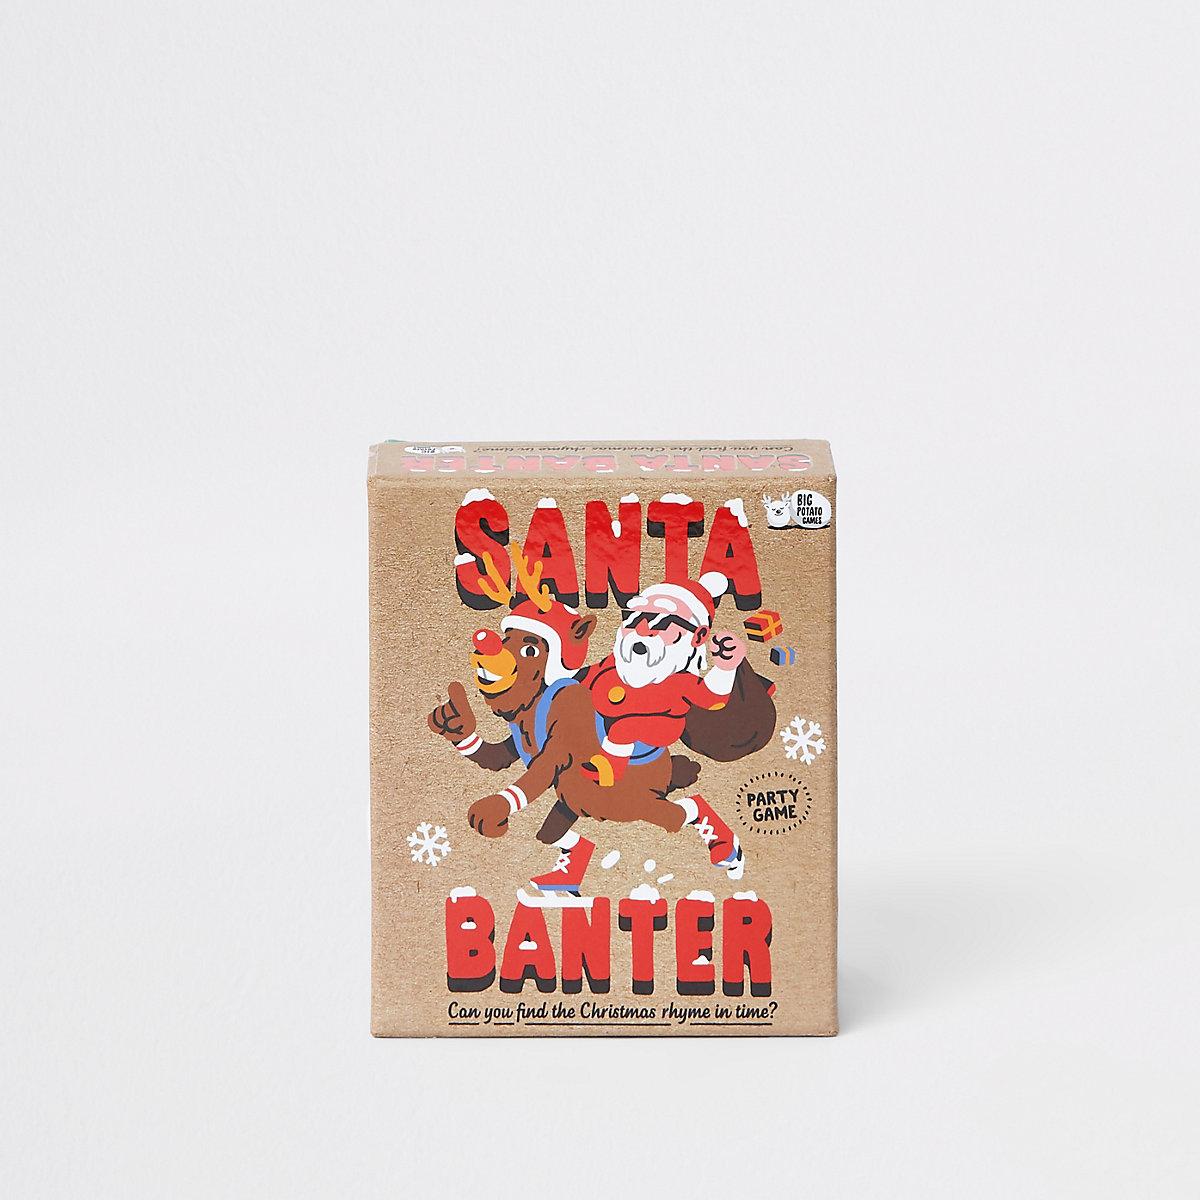 'Santa banter' party game